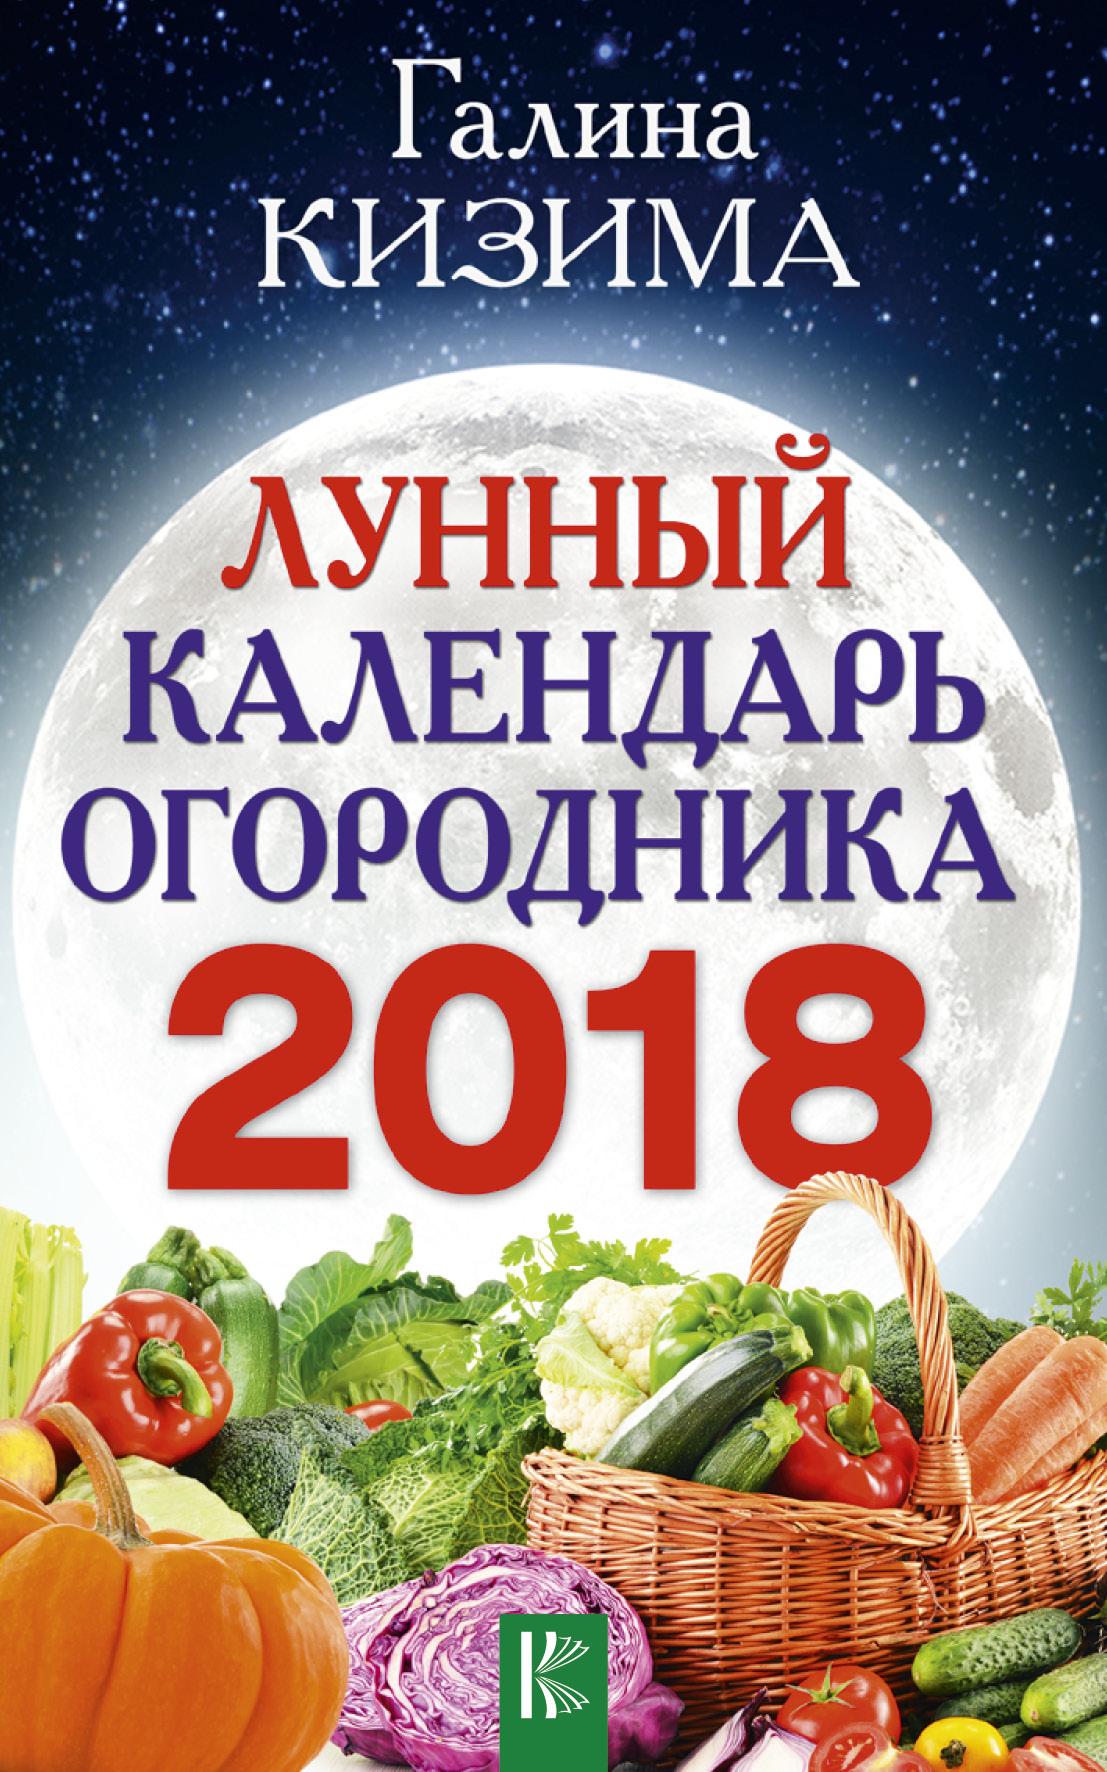 Лунный календарь огородника на 2018 год ( Кизима Г.А.  )